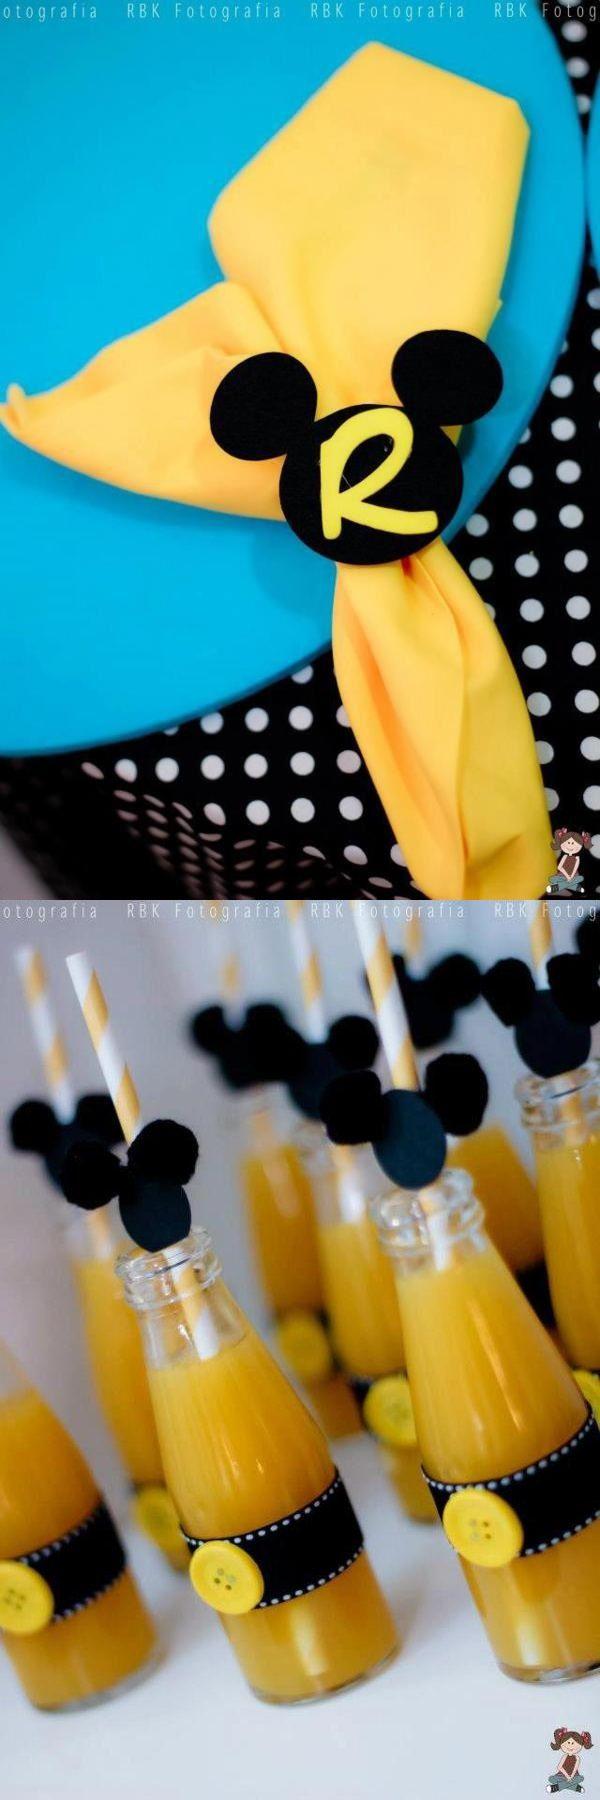 decoracao festa mickey : decoracao festa mickey:festa mickey decoração